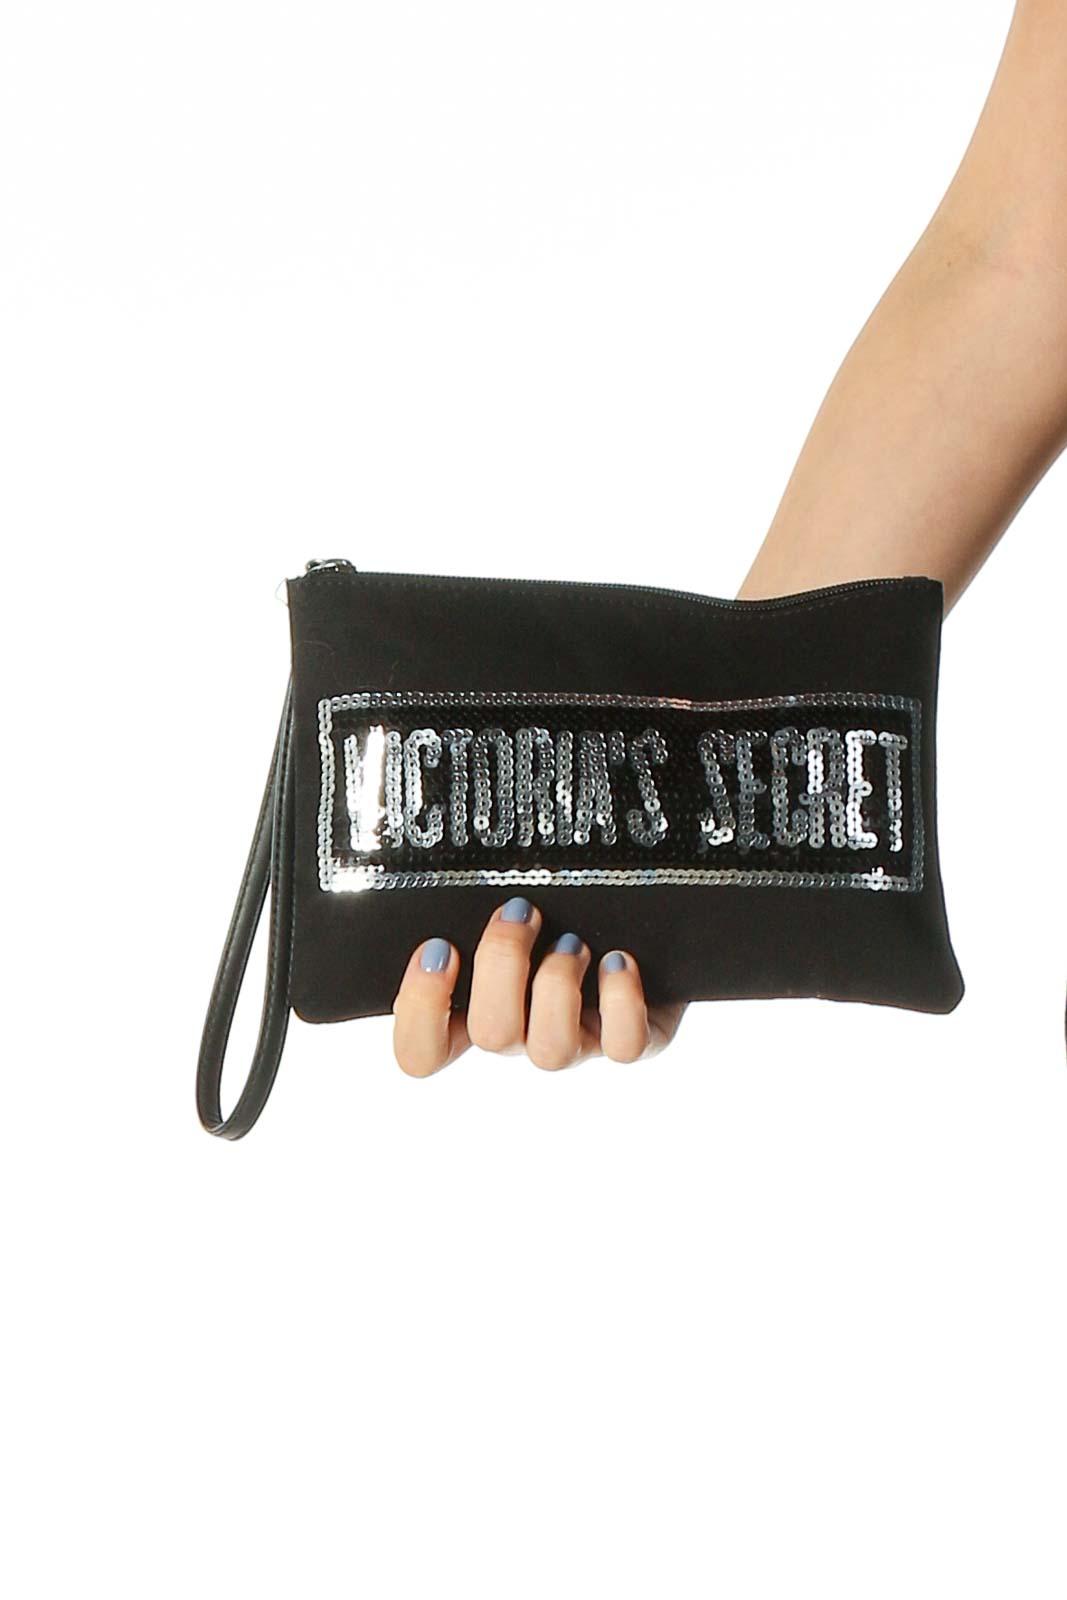 Black Sequined Zippered Bag Front